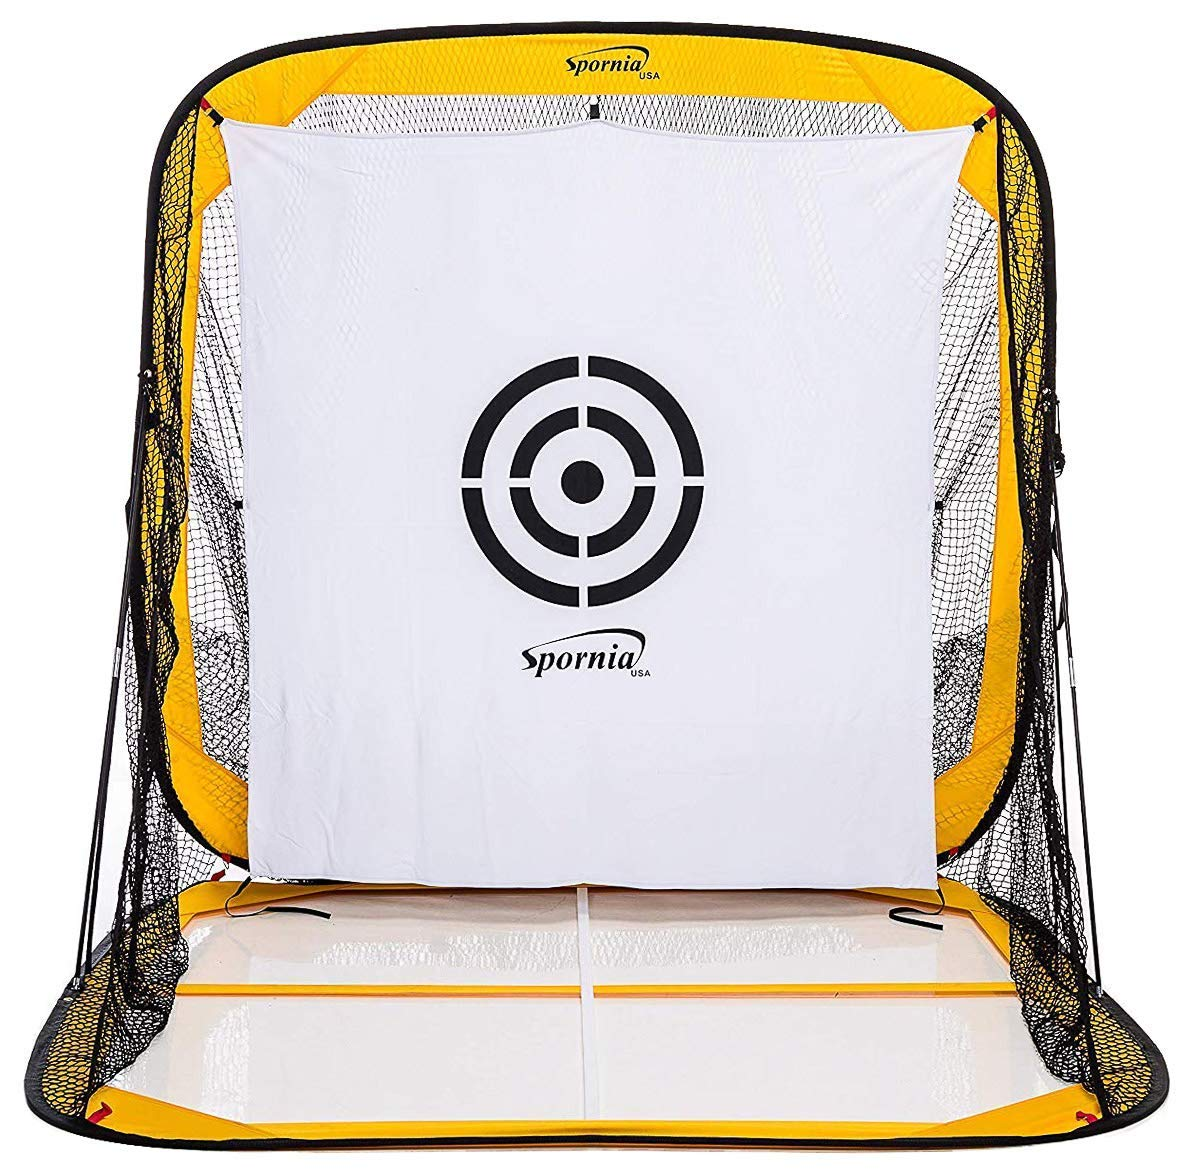 Spornia 7x7x7フィート マルチスポーツゴルフ練習ネット ゴルフネットのみ  B07NDN8JP1